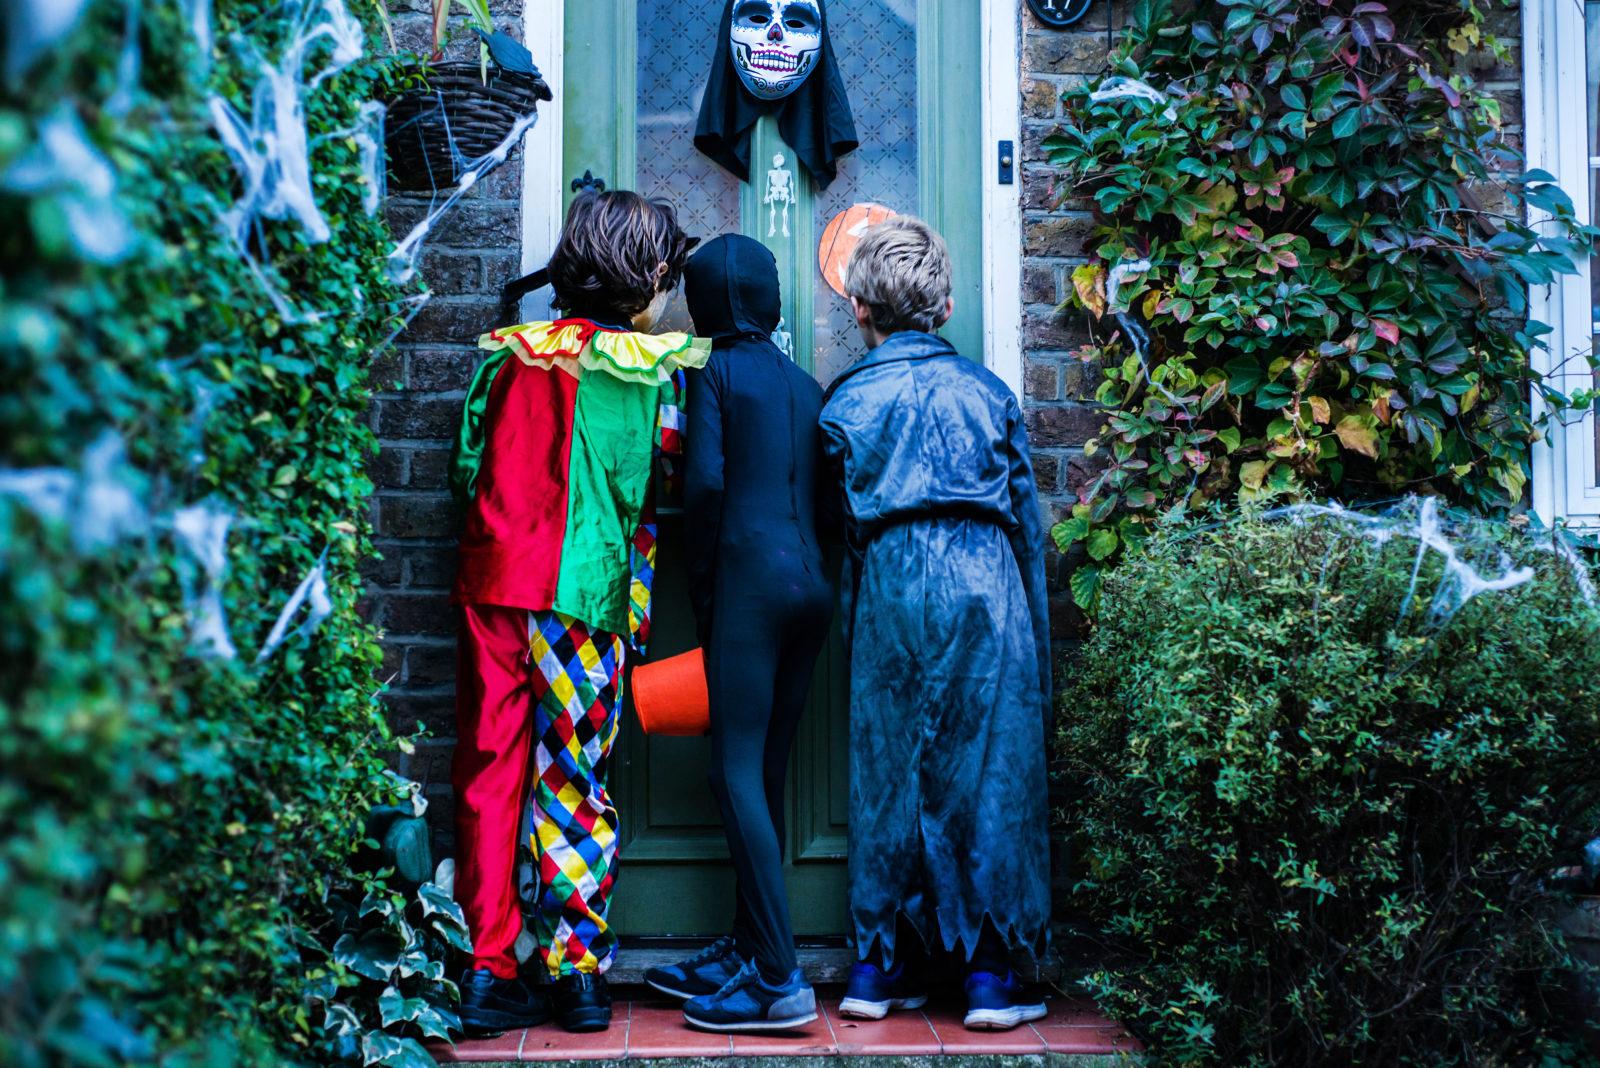 Vonwegen amerikanischer Konsumterror - Happy Halloween euch allen!